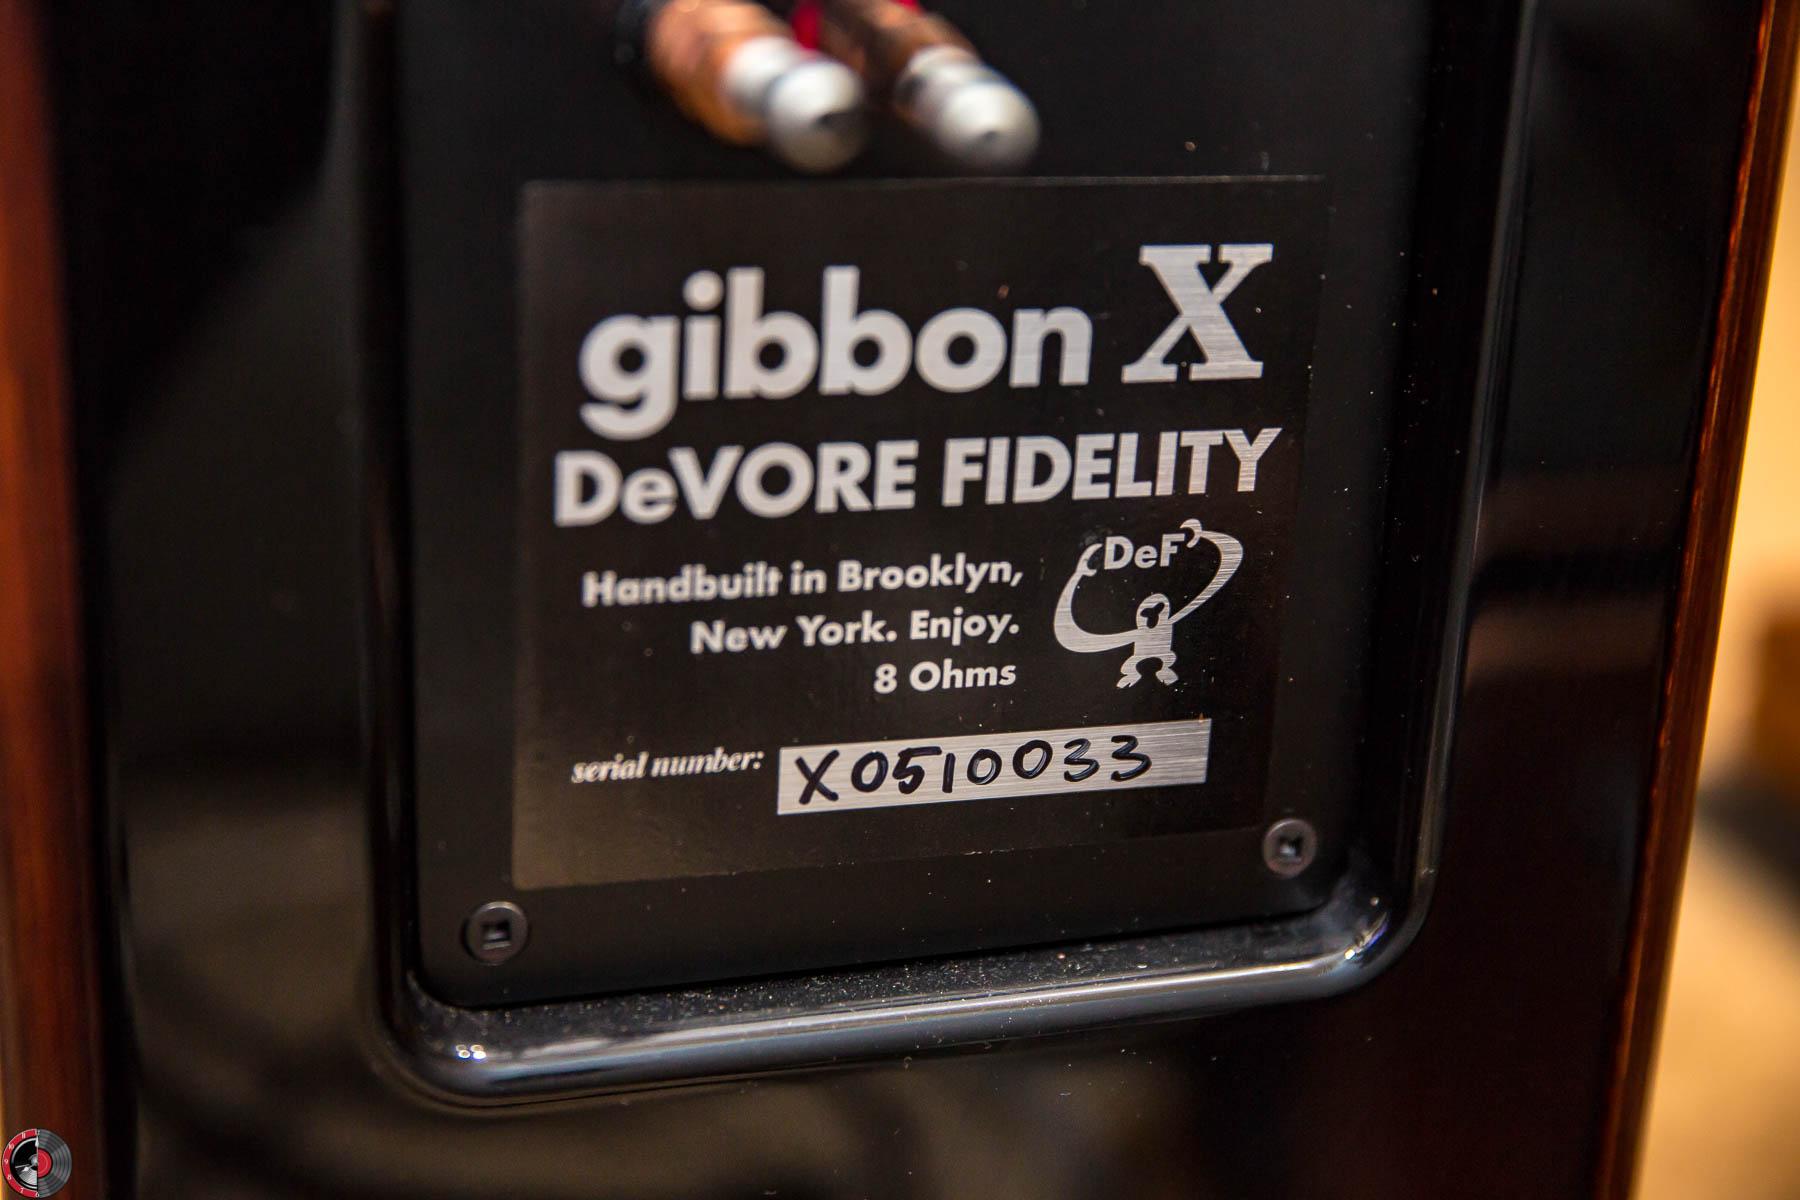 Review: DeVore Fidelity Gibbon X